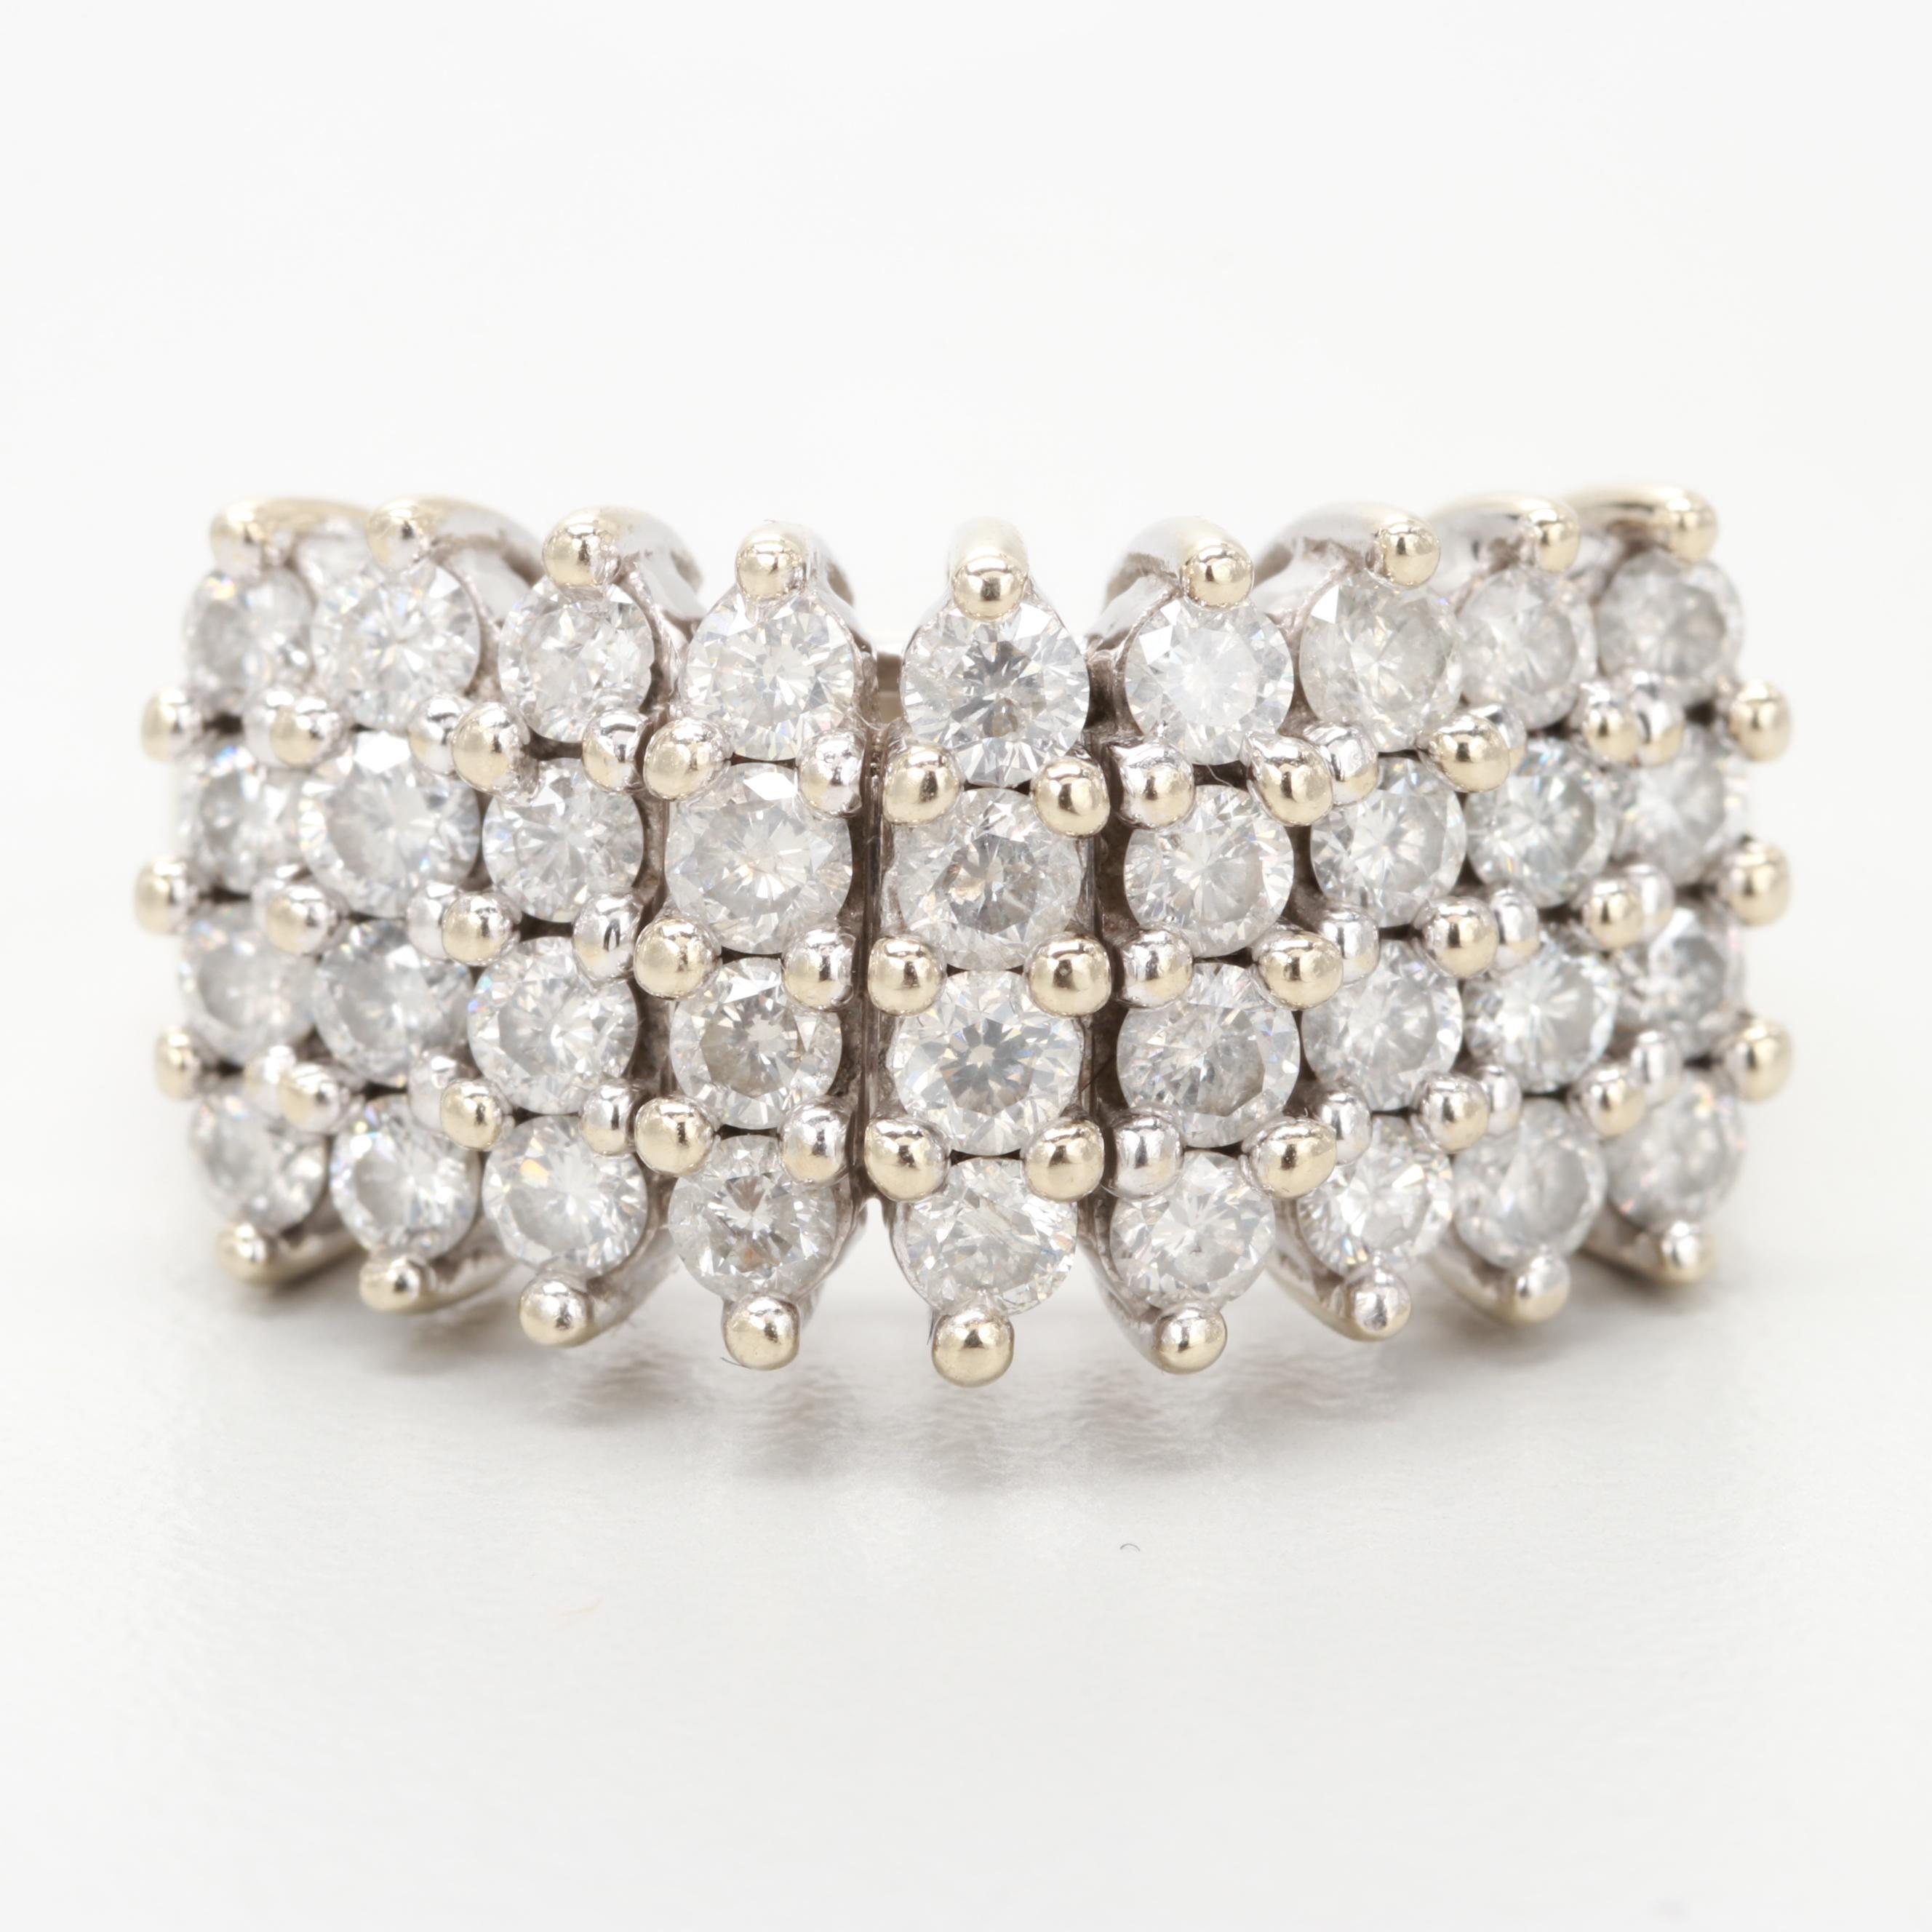 14K White Gold 2.02 CTW Diamond Ring